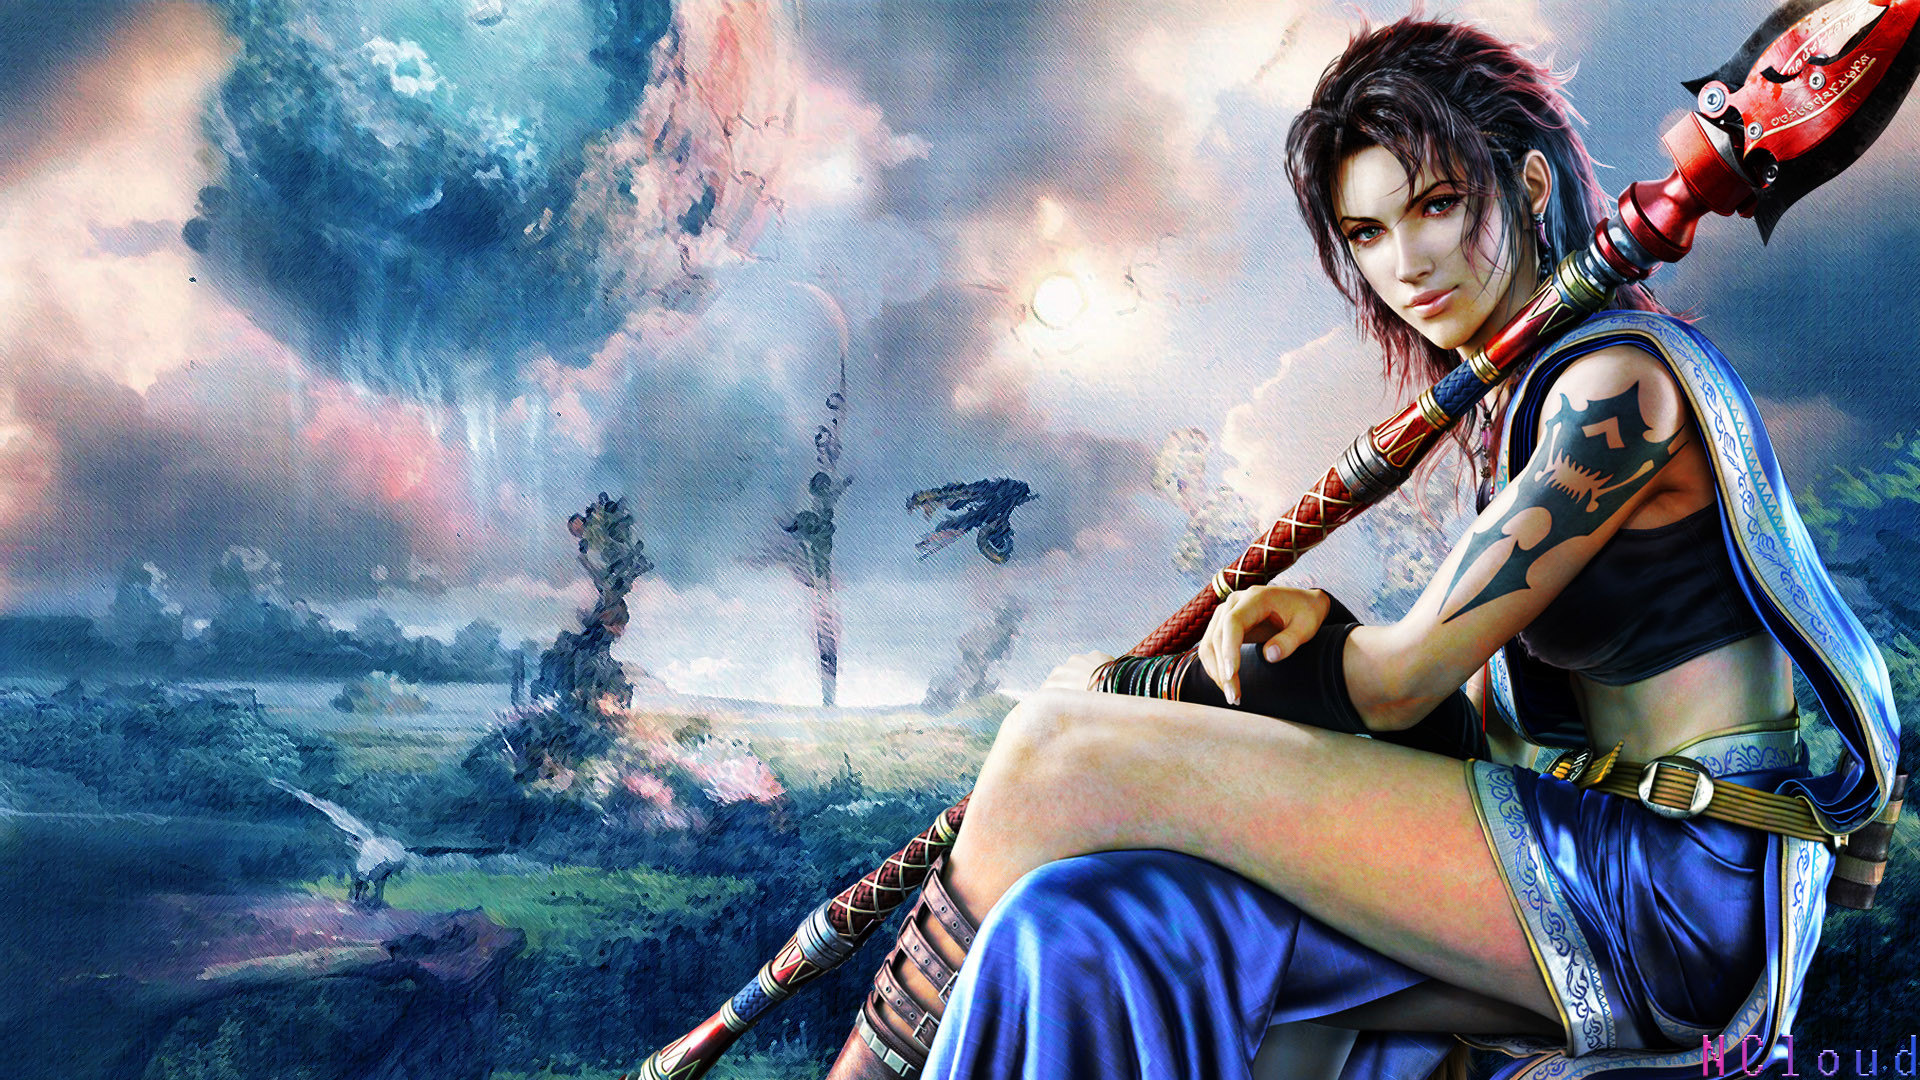 Final Fantasy Game Wallpaper HD wallpapers – Final Fantasy Game .